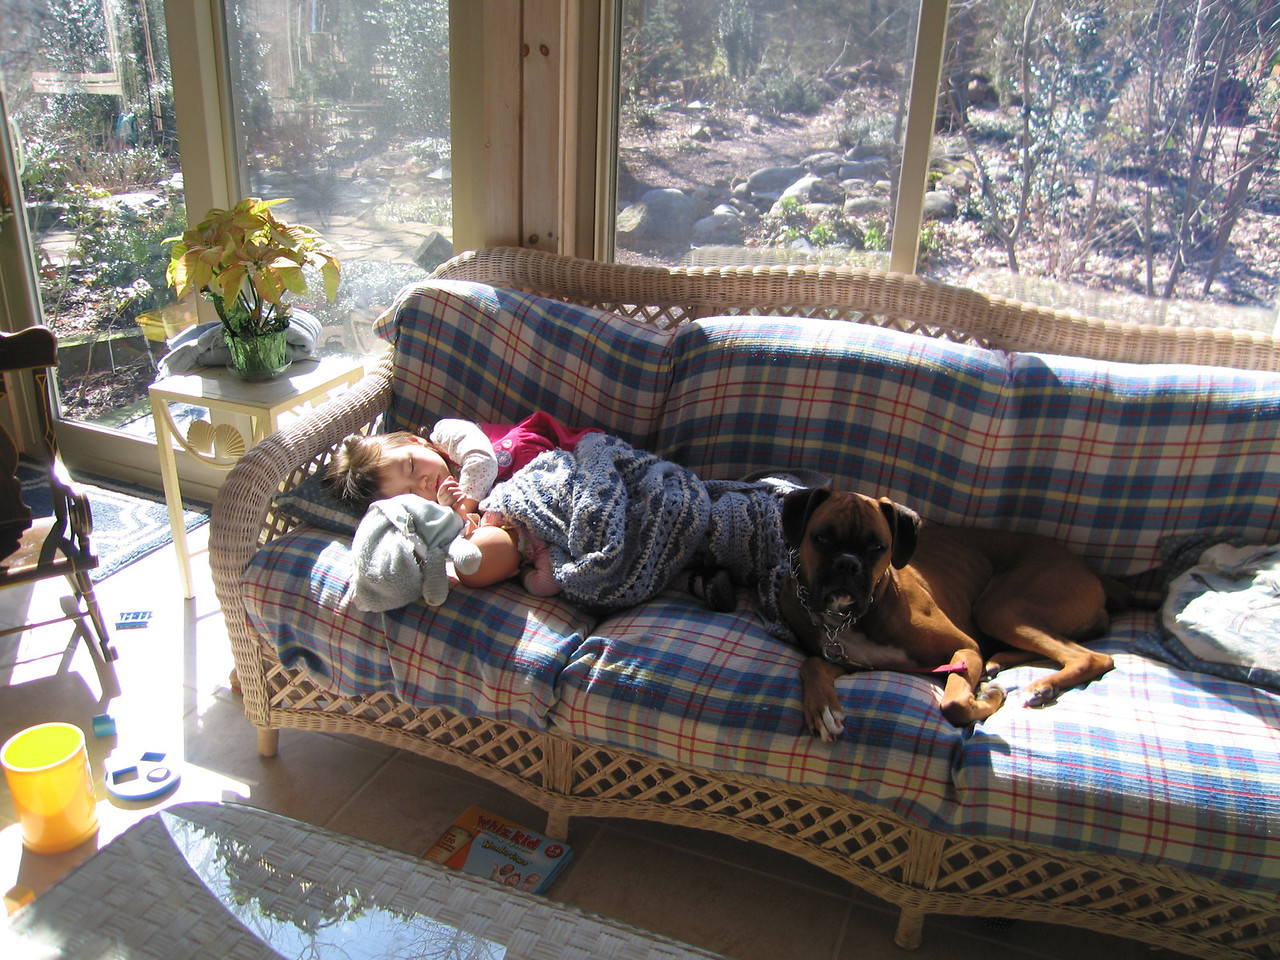 Kaidyn and Daisy taking a nap